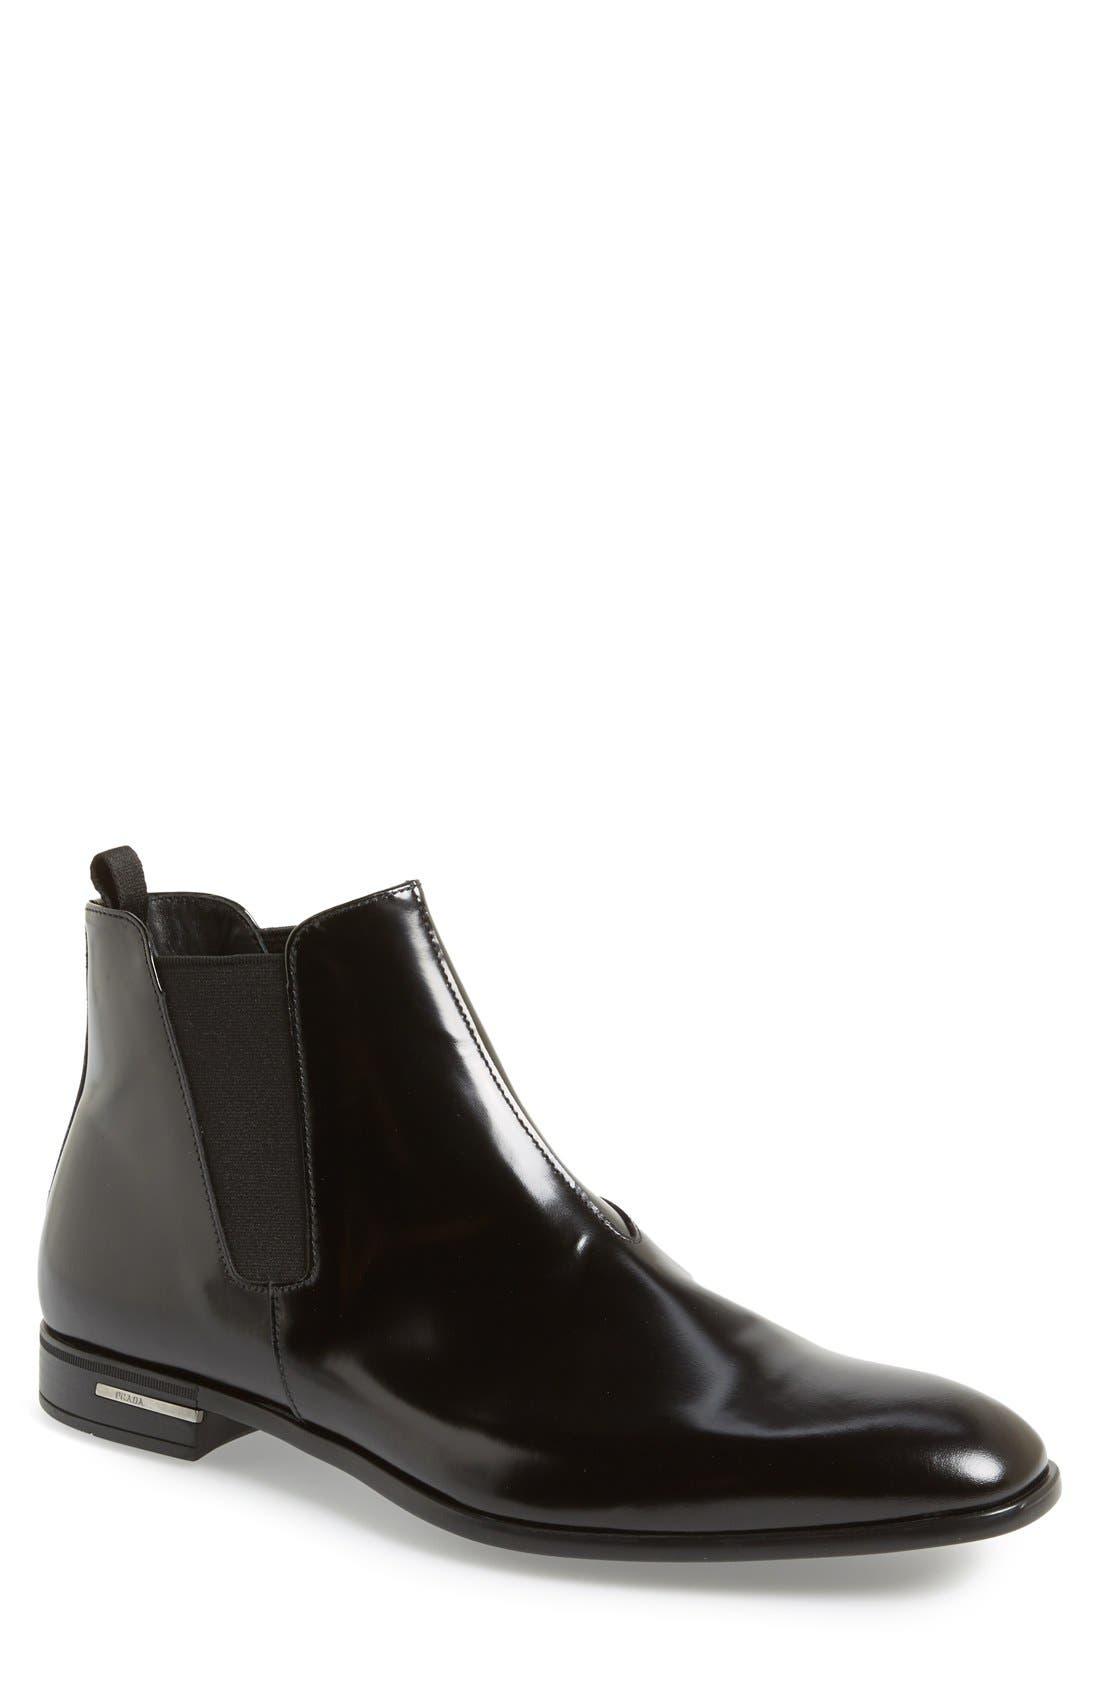 Main Image - Prada 'Spazzolato' Chelsea Boot (Men)